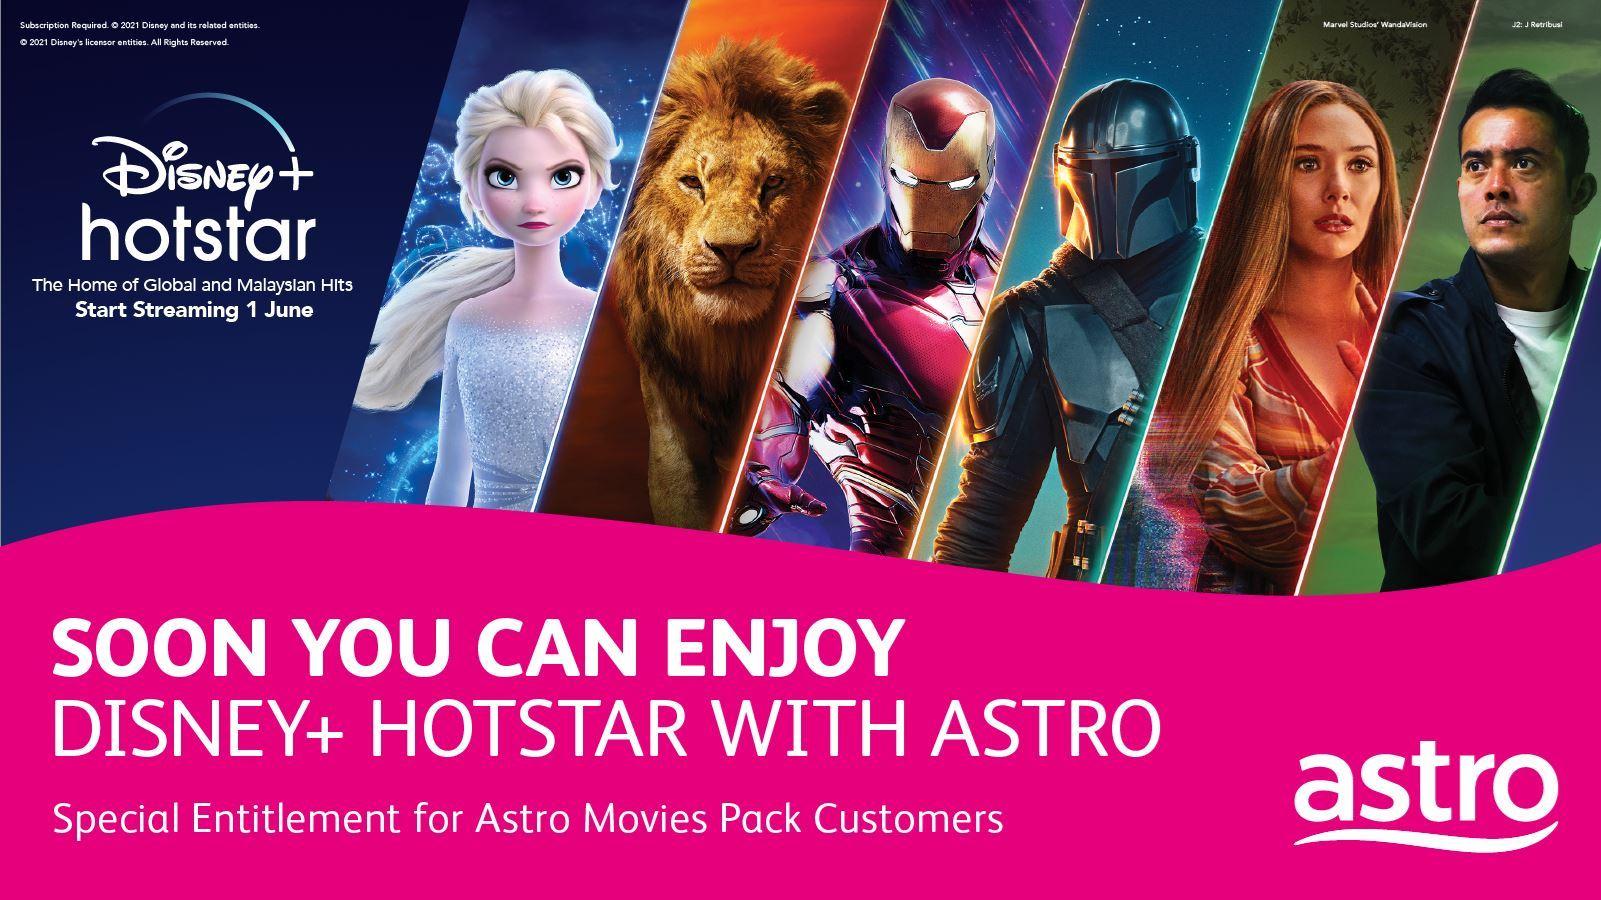 astro 电影配套客户很快即能享受 disney+ hotstar 线上串流服务!